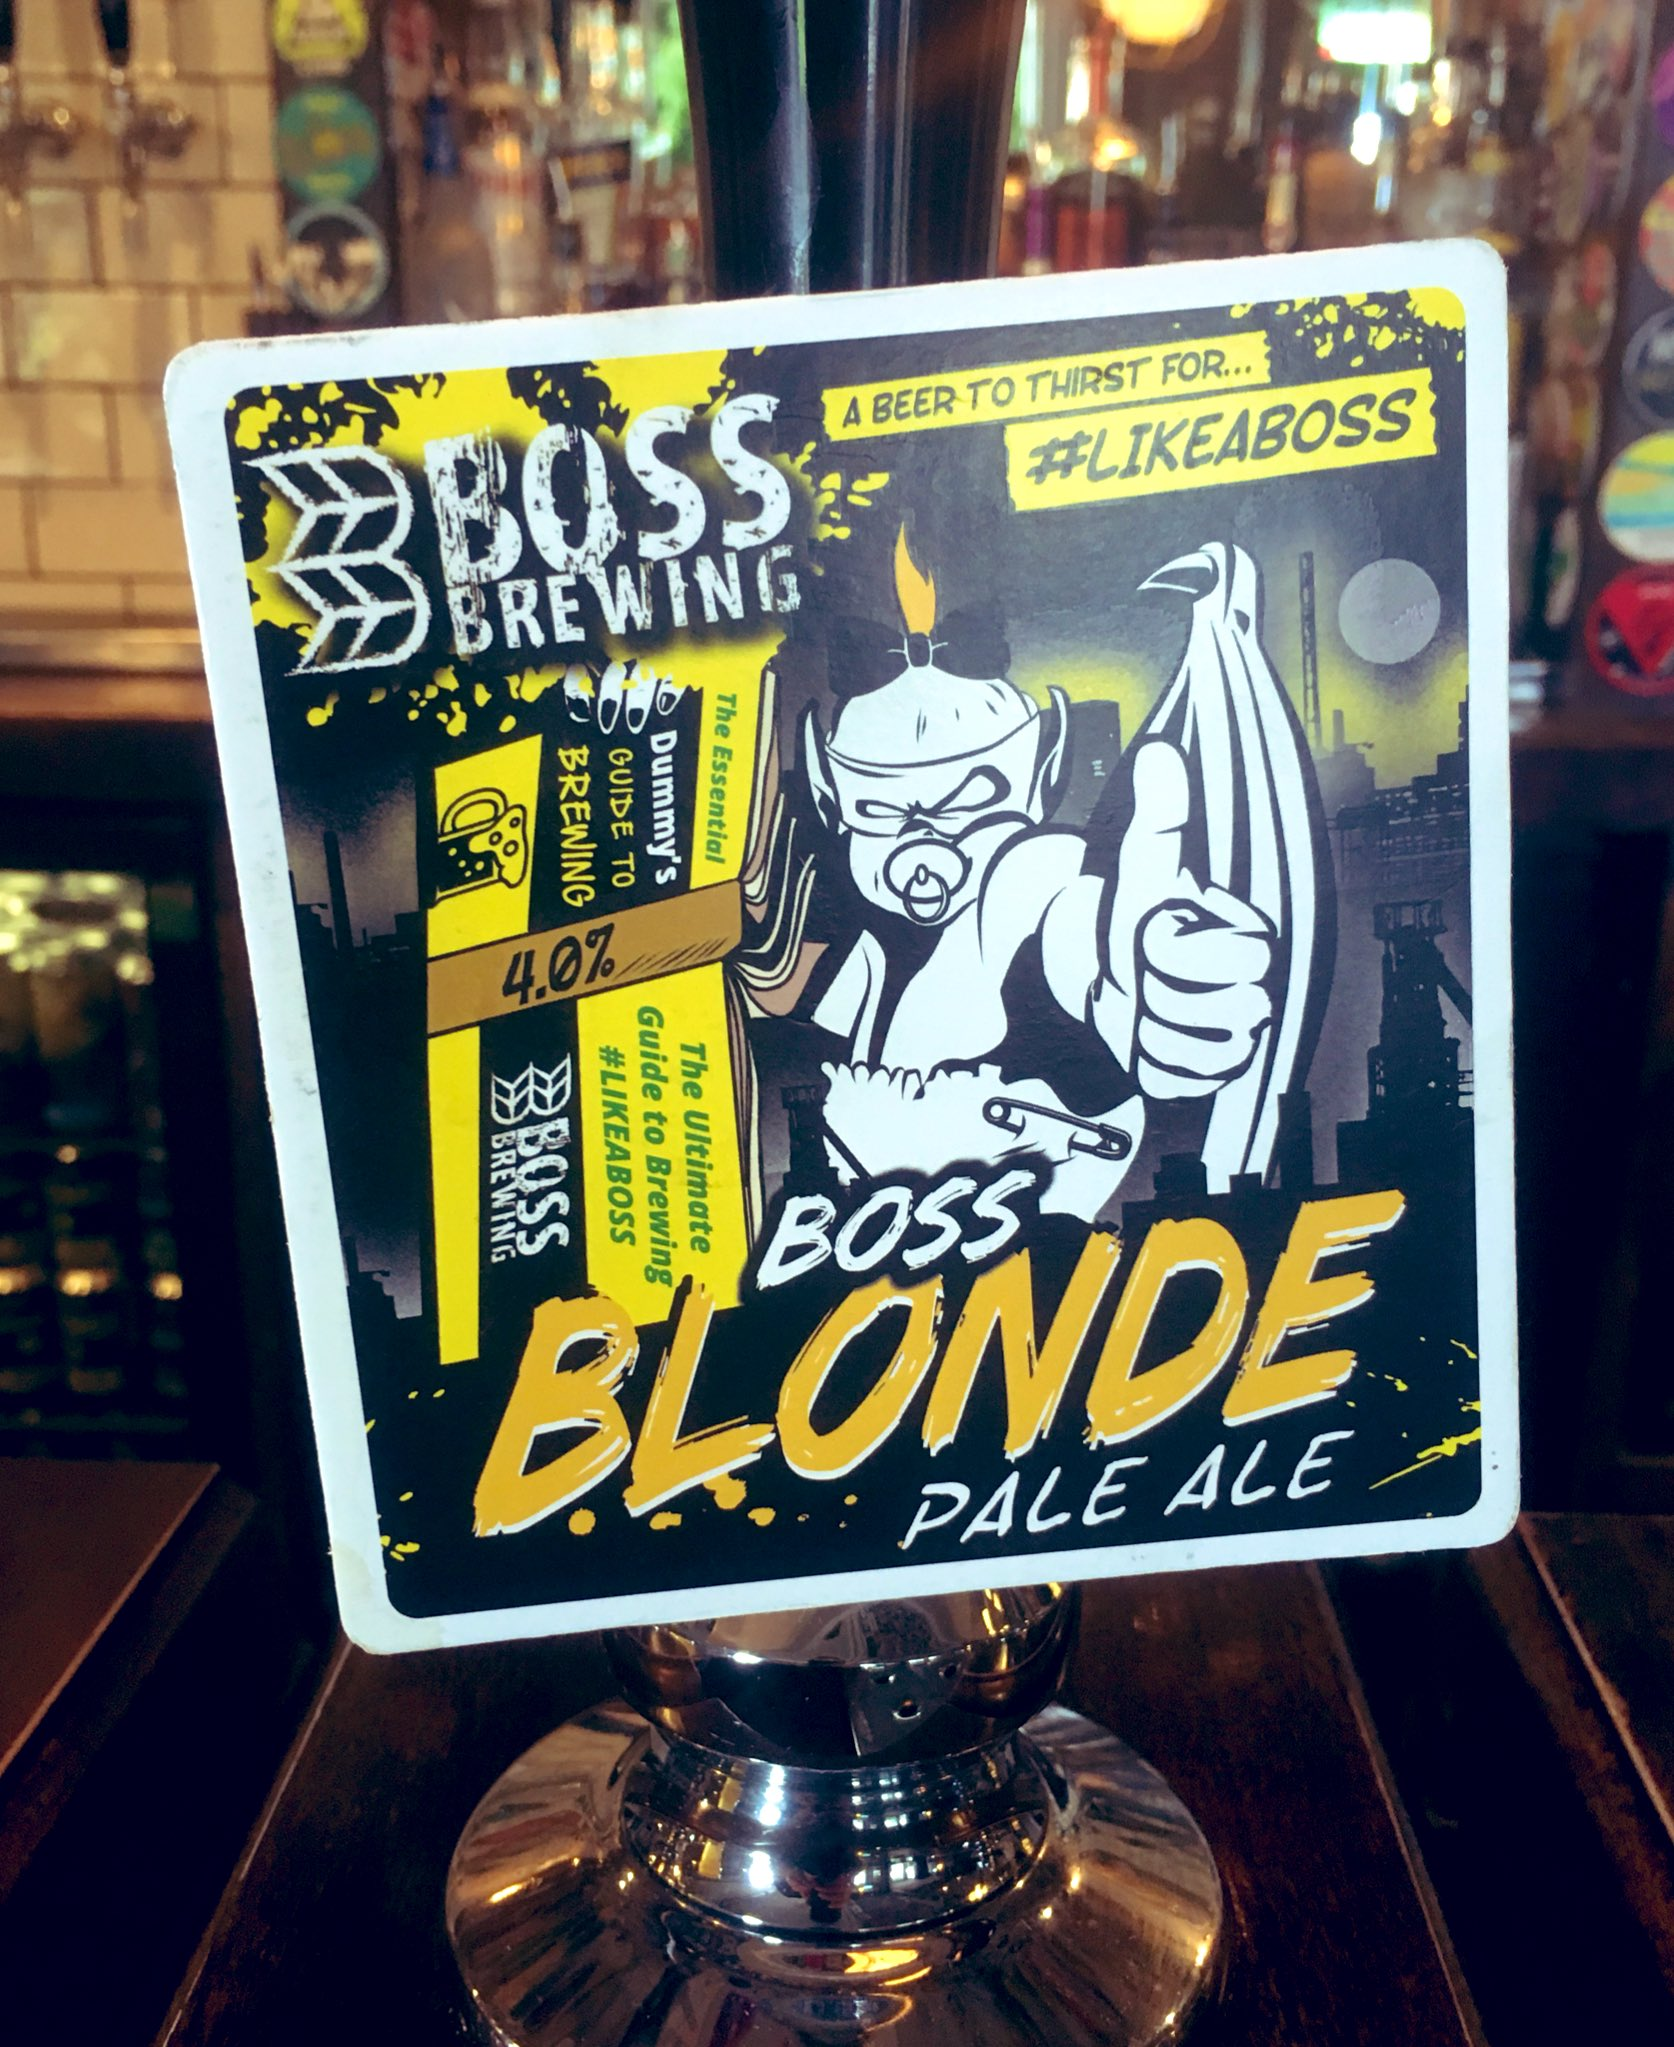 234: Boss Blonde